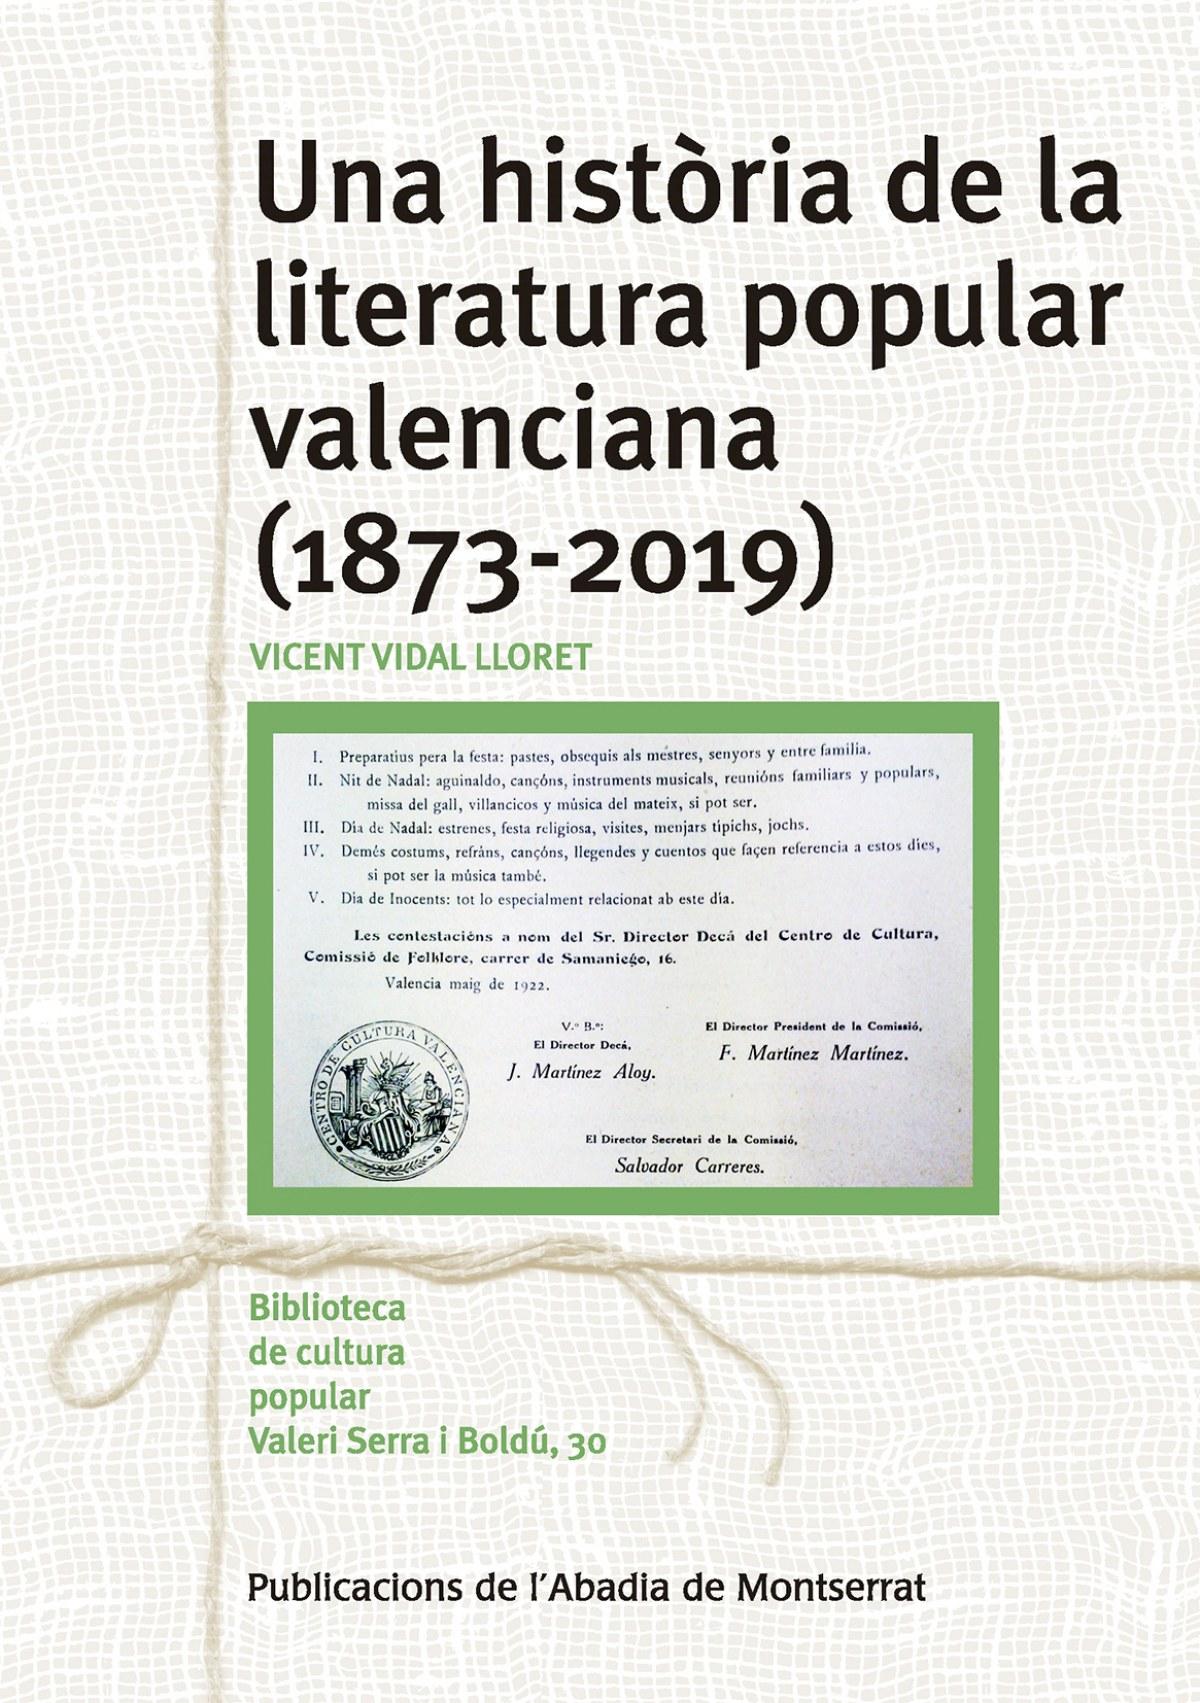 UNA HISTORIA DE LA LITERATURA POPULAR VALENCIANA (